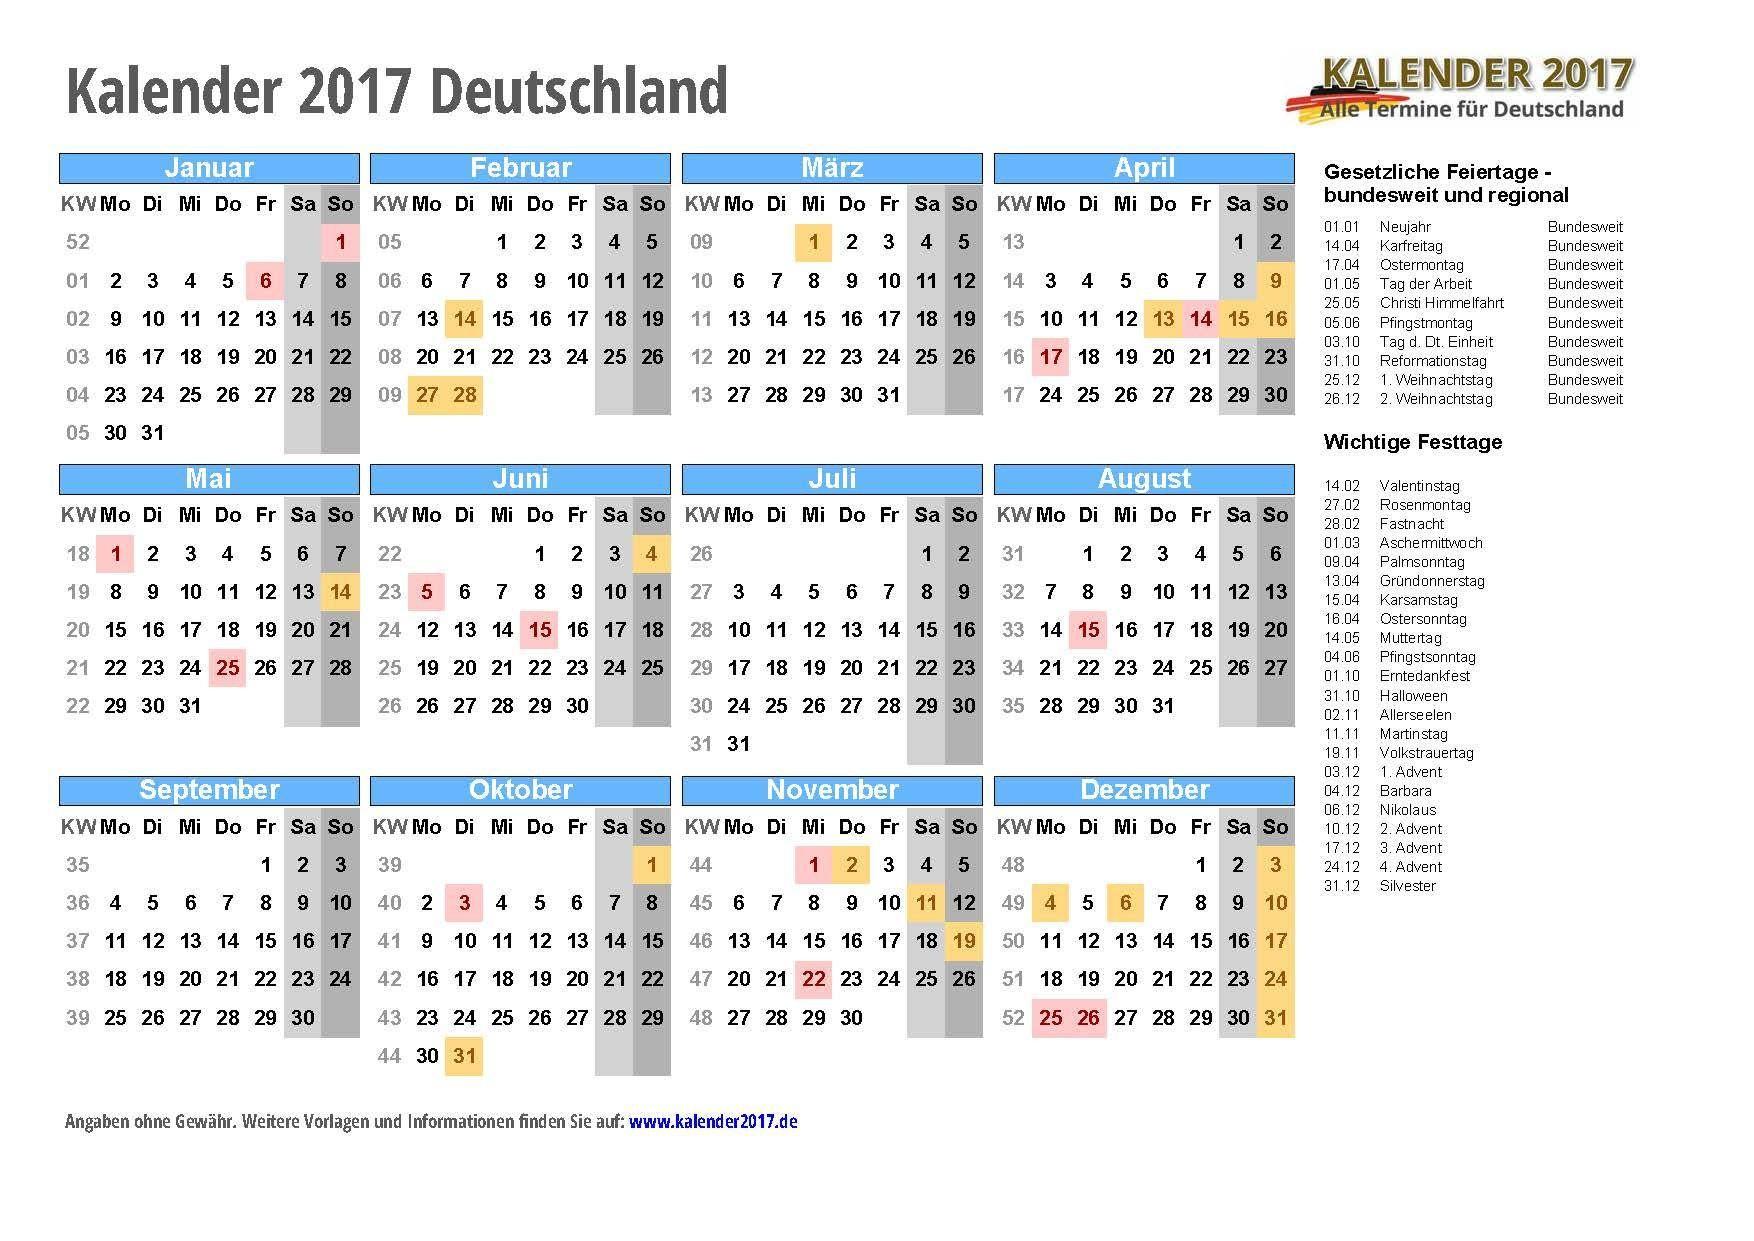 Kalender Tahun 2019 Pdf Más Recientes Kalender Bilder Drucken Of Kalender Tahun 2019 Pdf Más Recientes Awesome 42 Illustration islamic Calendar 2018 Uk Kalendar islam 2018